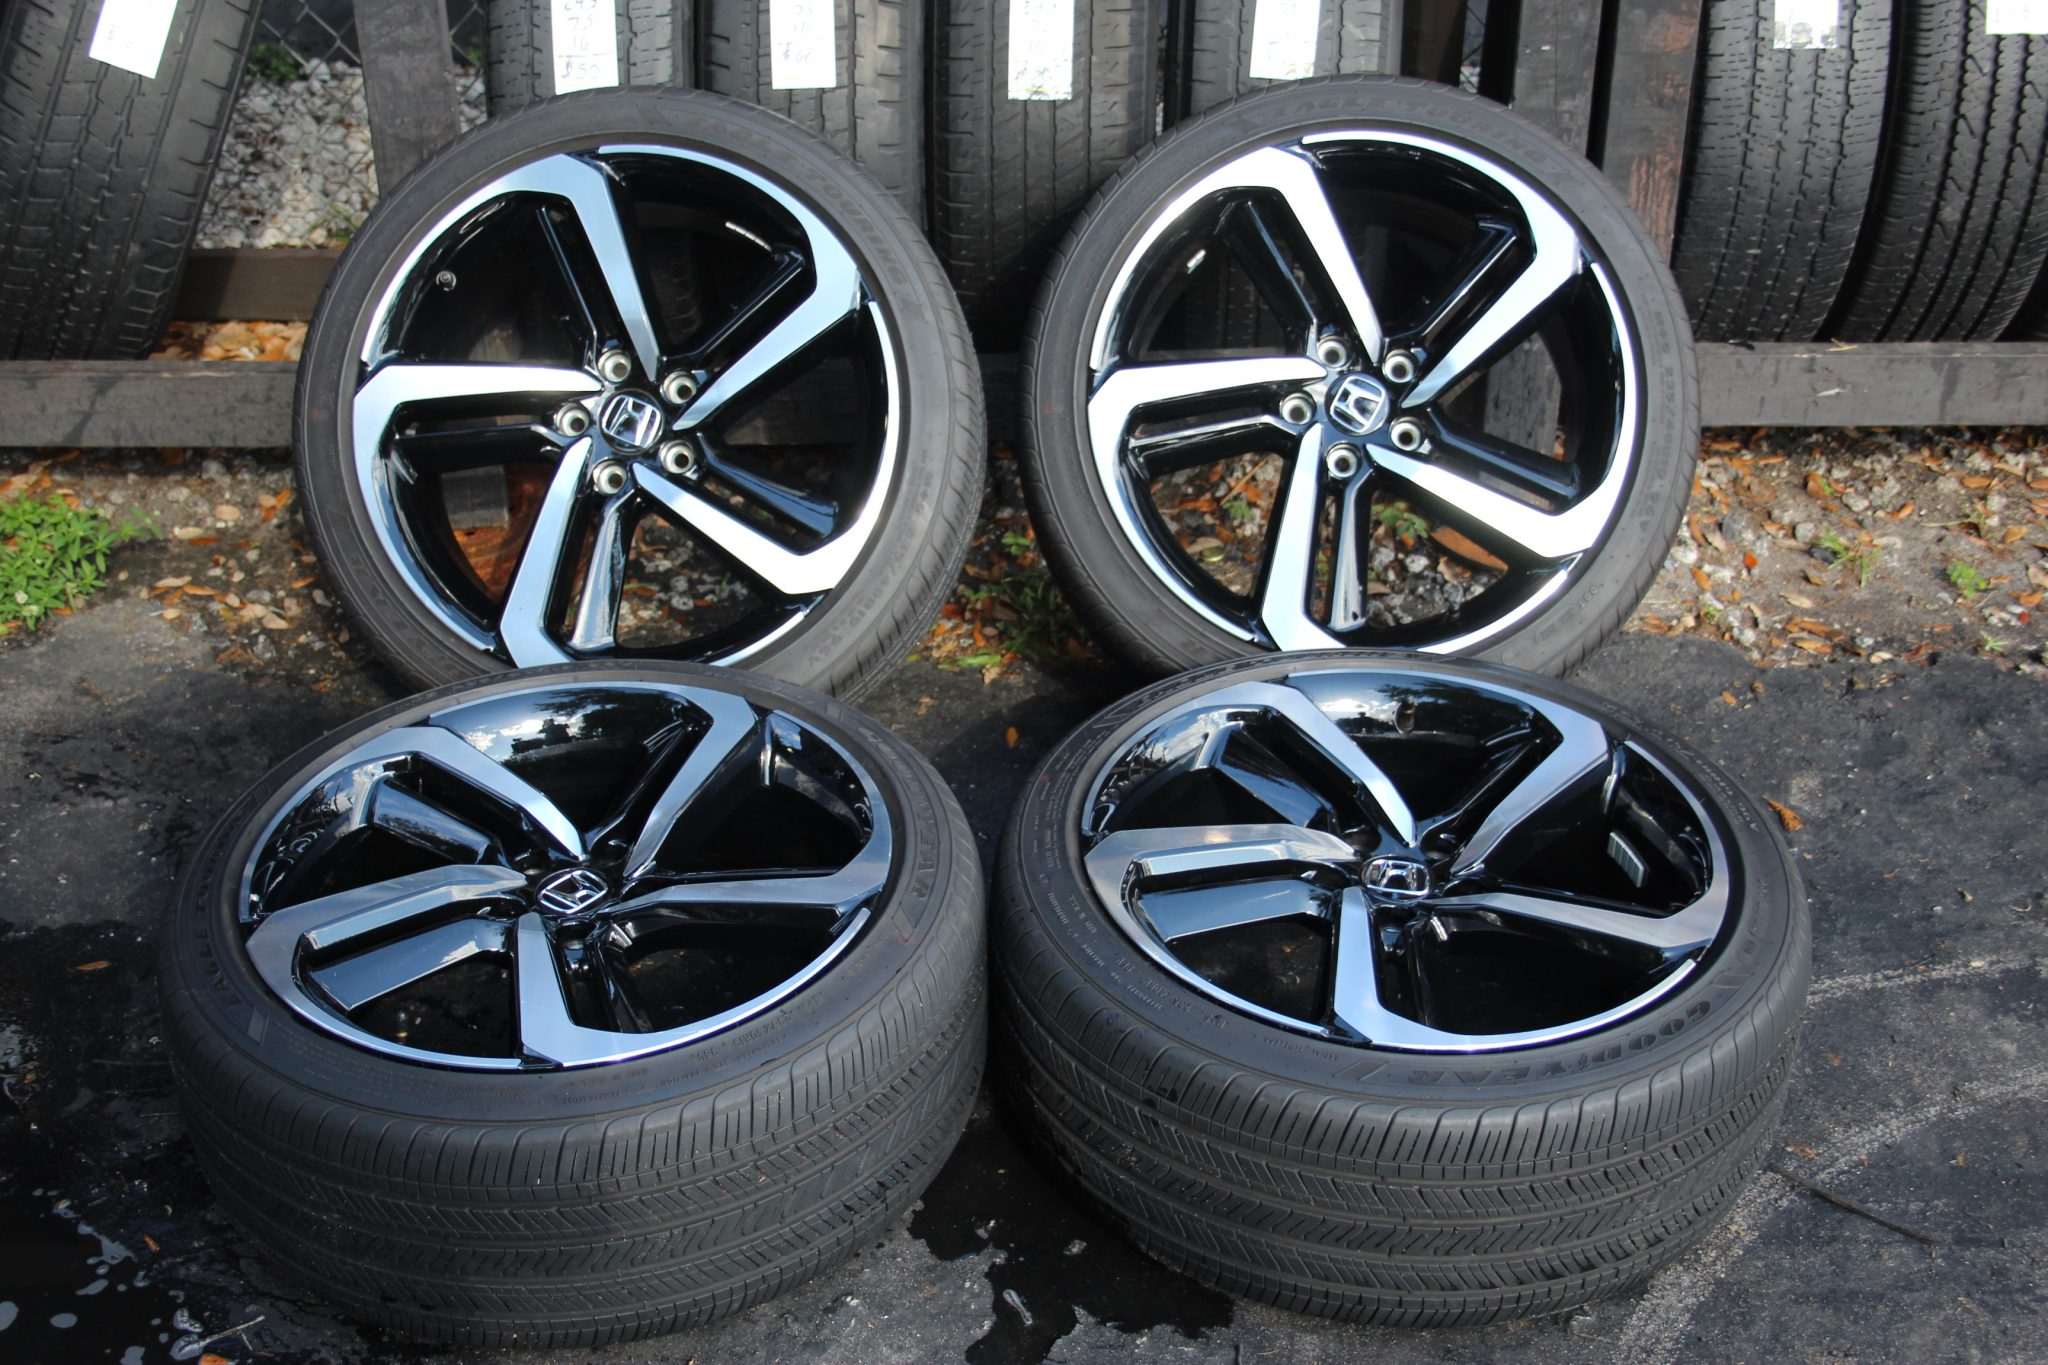 Honda Accord Tires >> Set Of 4 Honda Accord Sport 2018 2019 19 Oem Rims Tires 64127 42700tvaa94 4118